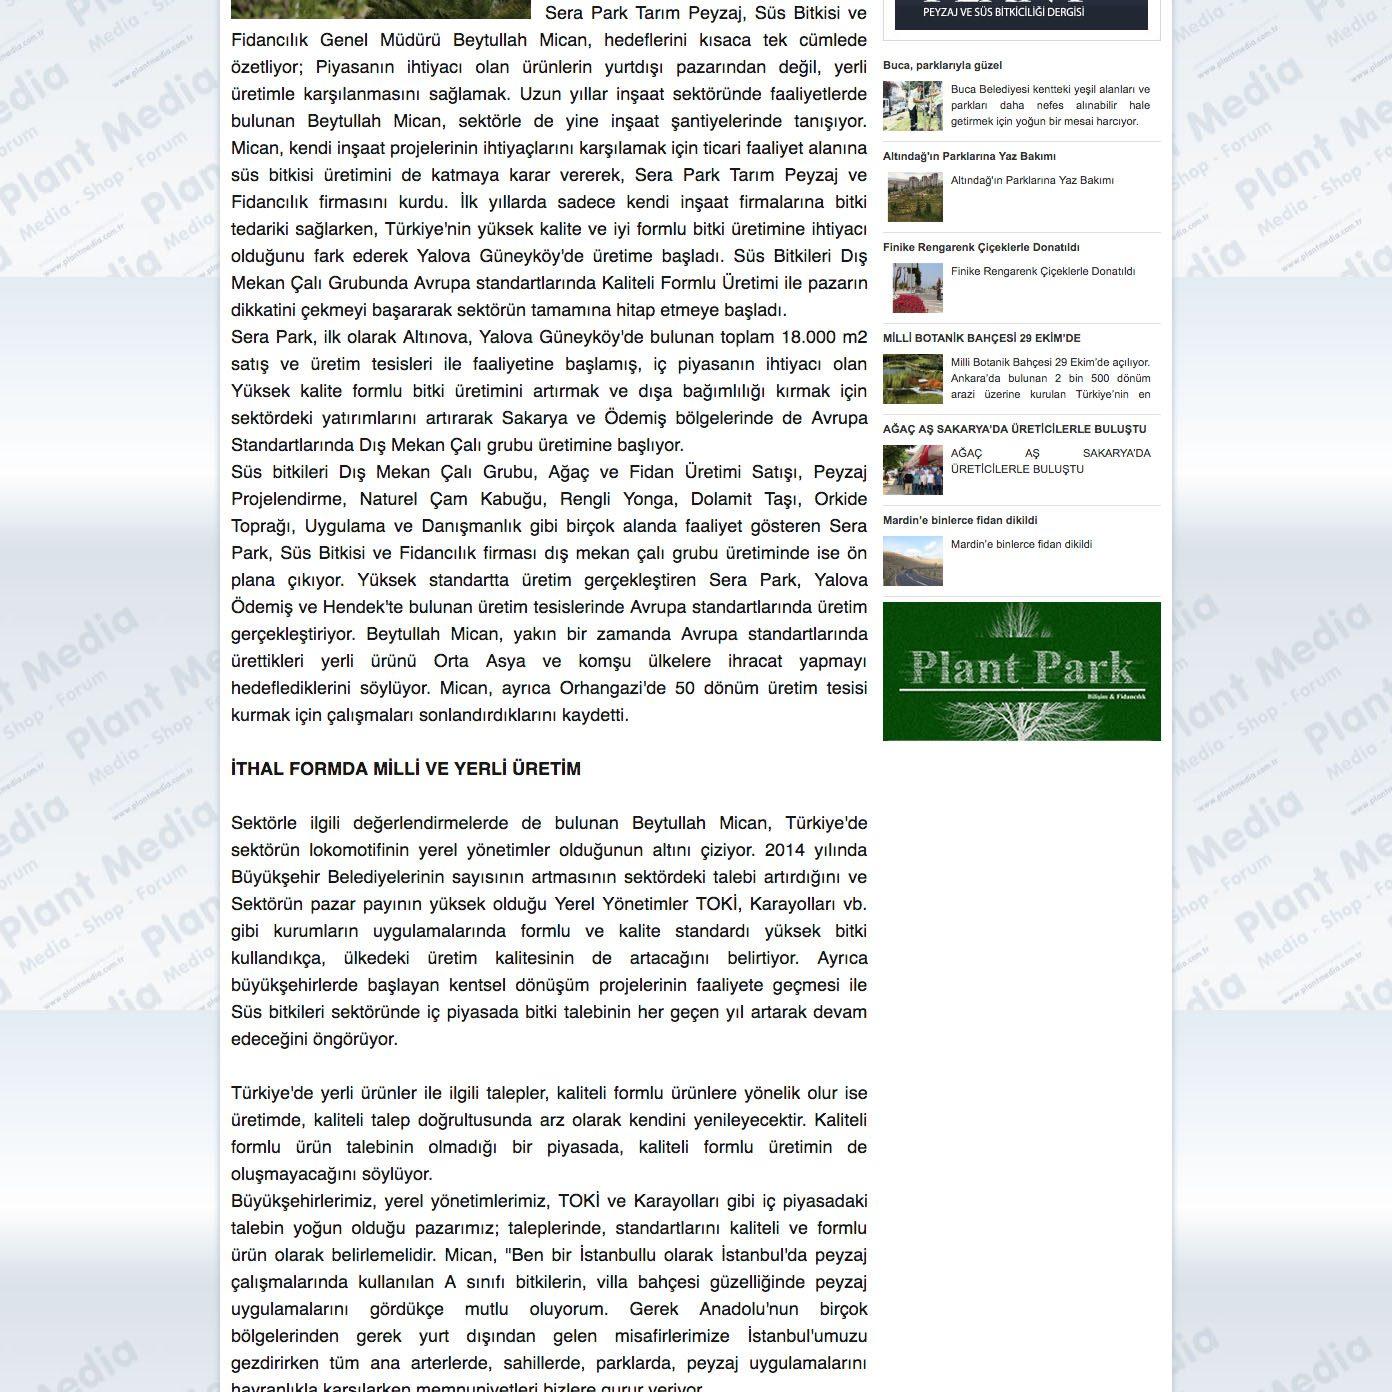 plantmedia-tr-Haberler-asp-2018-07-25-17_22_00 copy